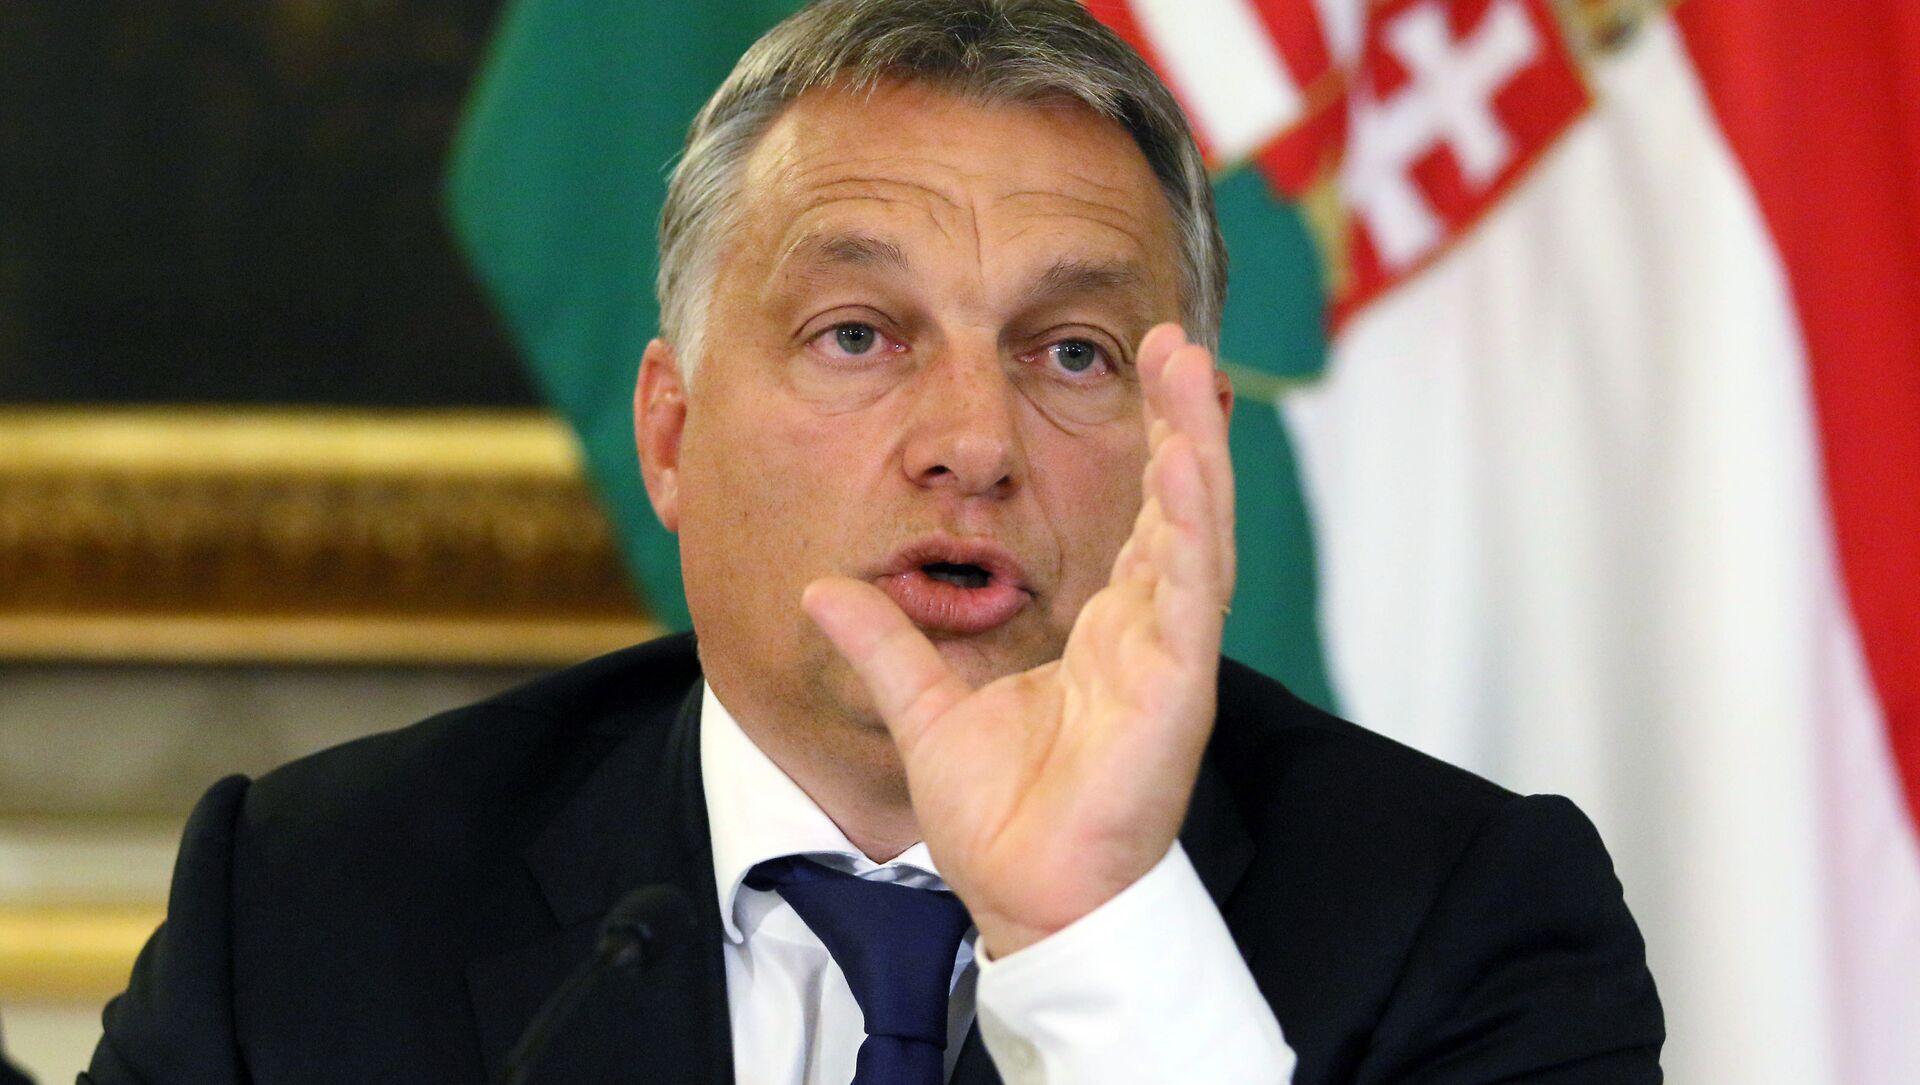 Il premier ungherese Viktor Orban - Sputnik Italia, 1920, 03.03.2021